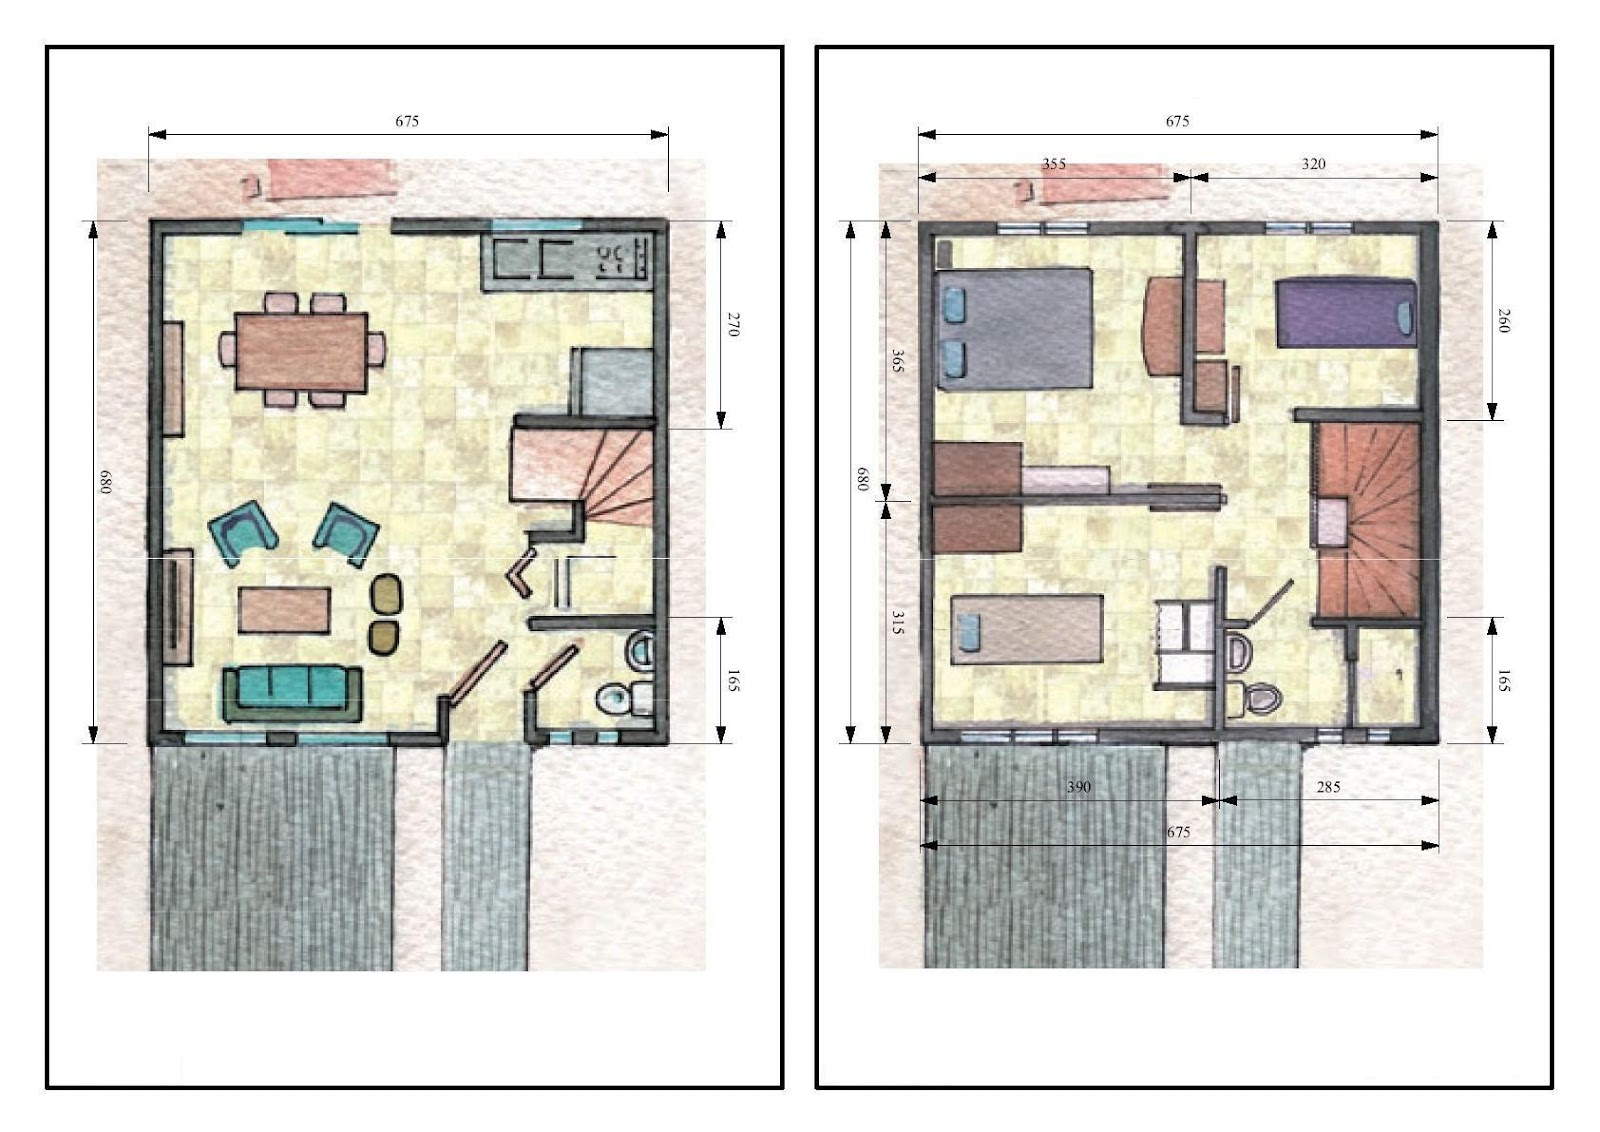 planos de casas modelos y dise os de casas planos On planos arquitectonicos de casas de dos plantas